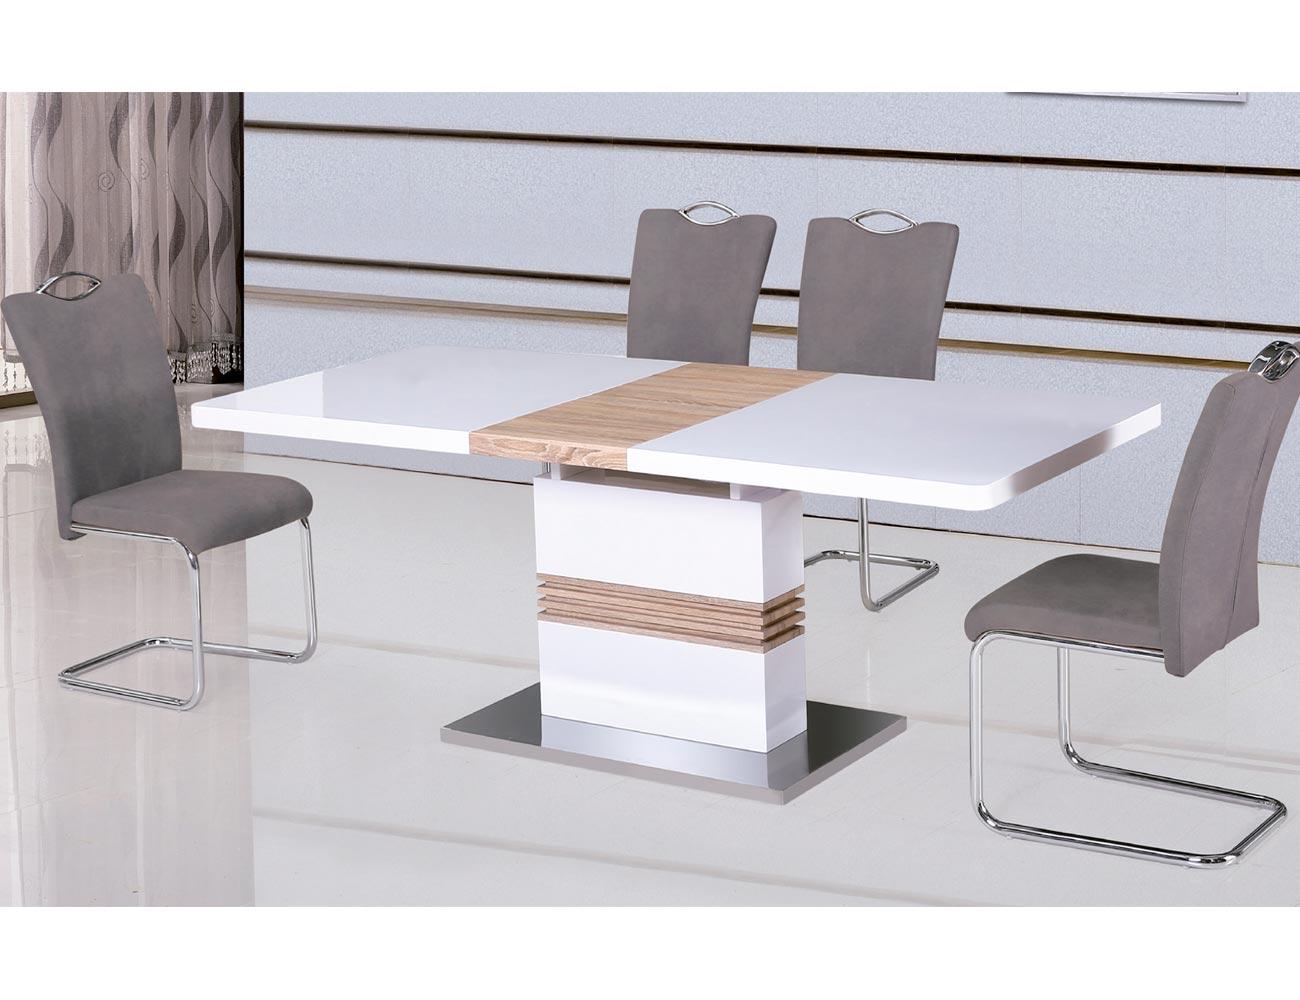 Mesa comedor dm blanco alto brillo 2